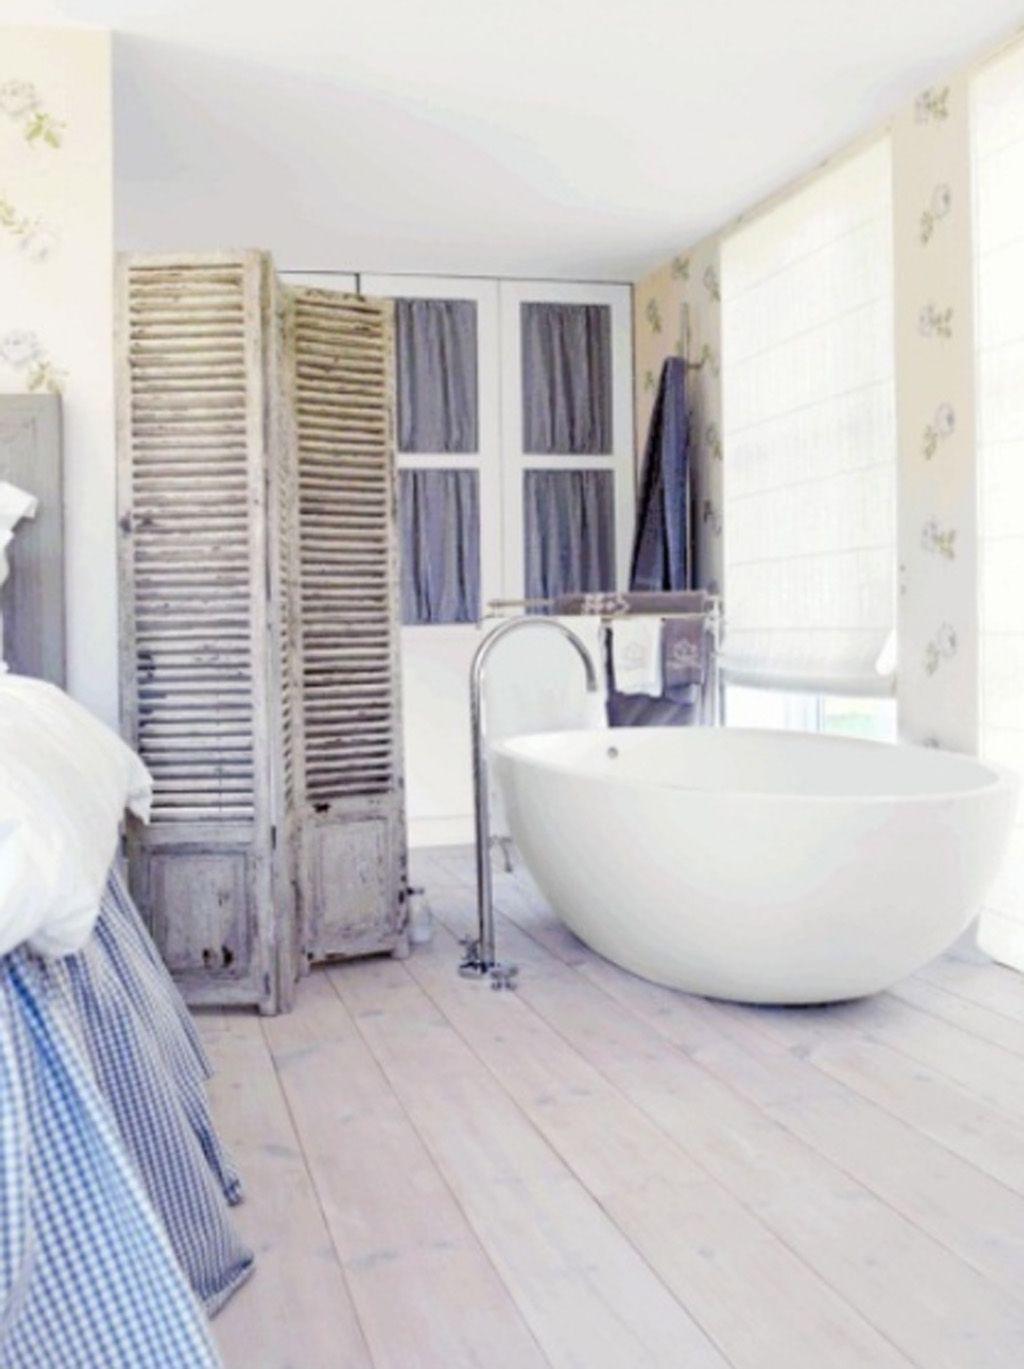 Shabby Chic Bathroom Ideas - http://www.sumitroy.co/8538/shabby-chic ...